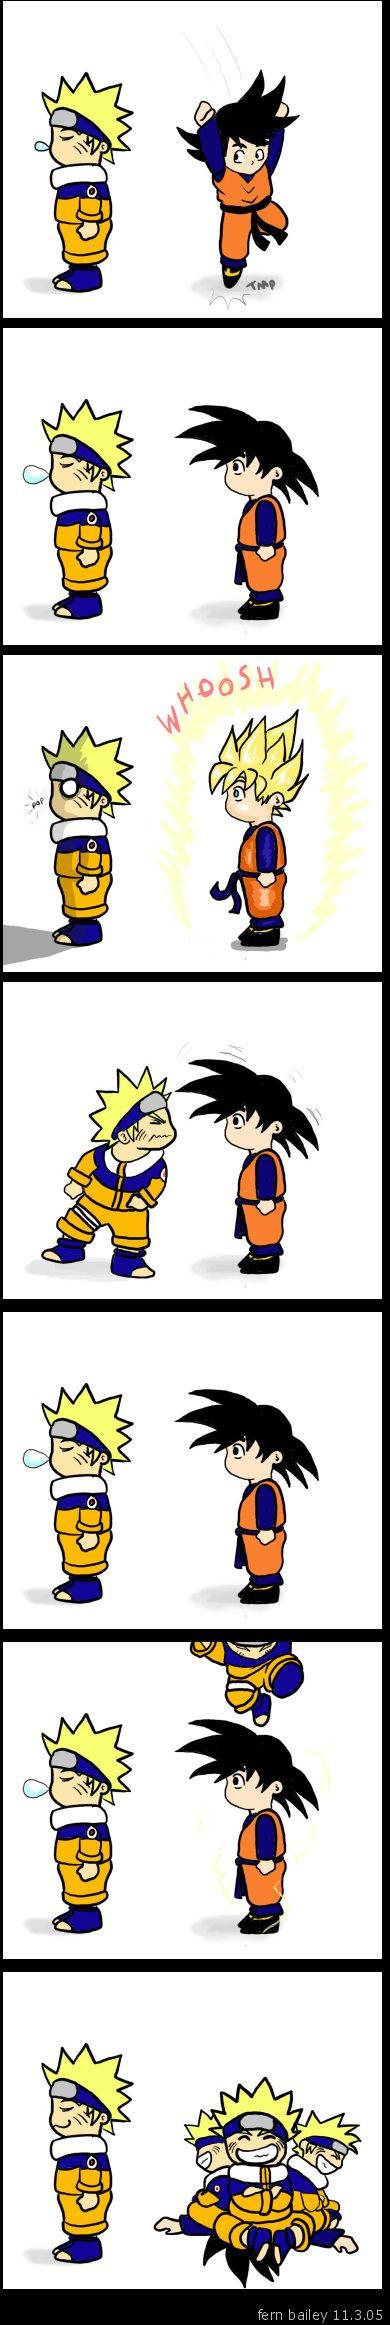 http://fc04.deviantart.com/fs6/i/2005/096/e/0/Goten_vs_Naruto_by_Ferntree.jpg